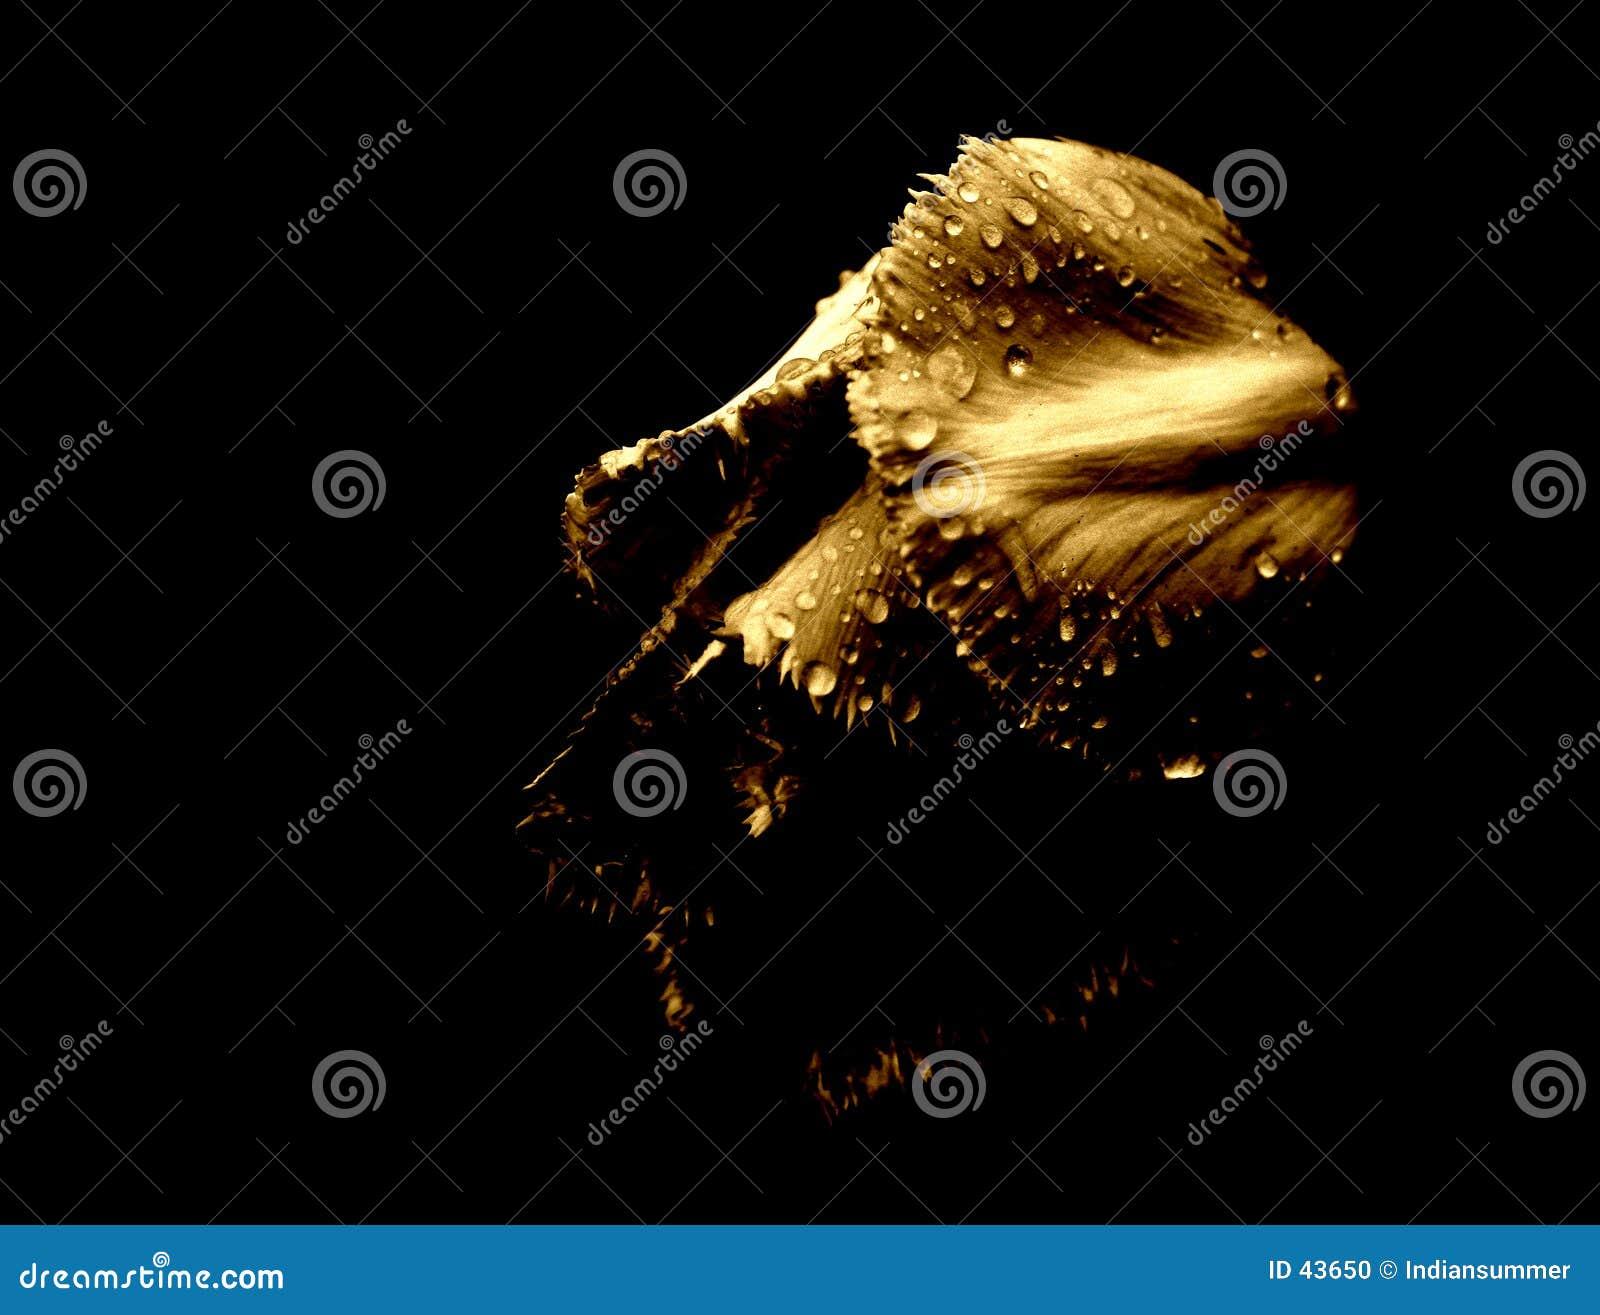 тюльпан дождя 4